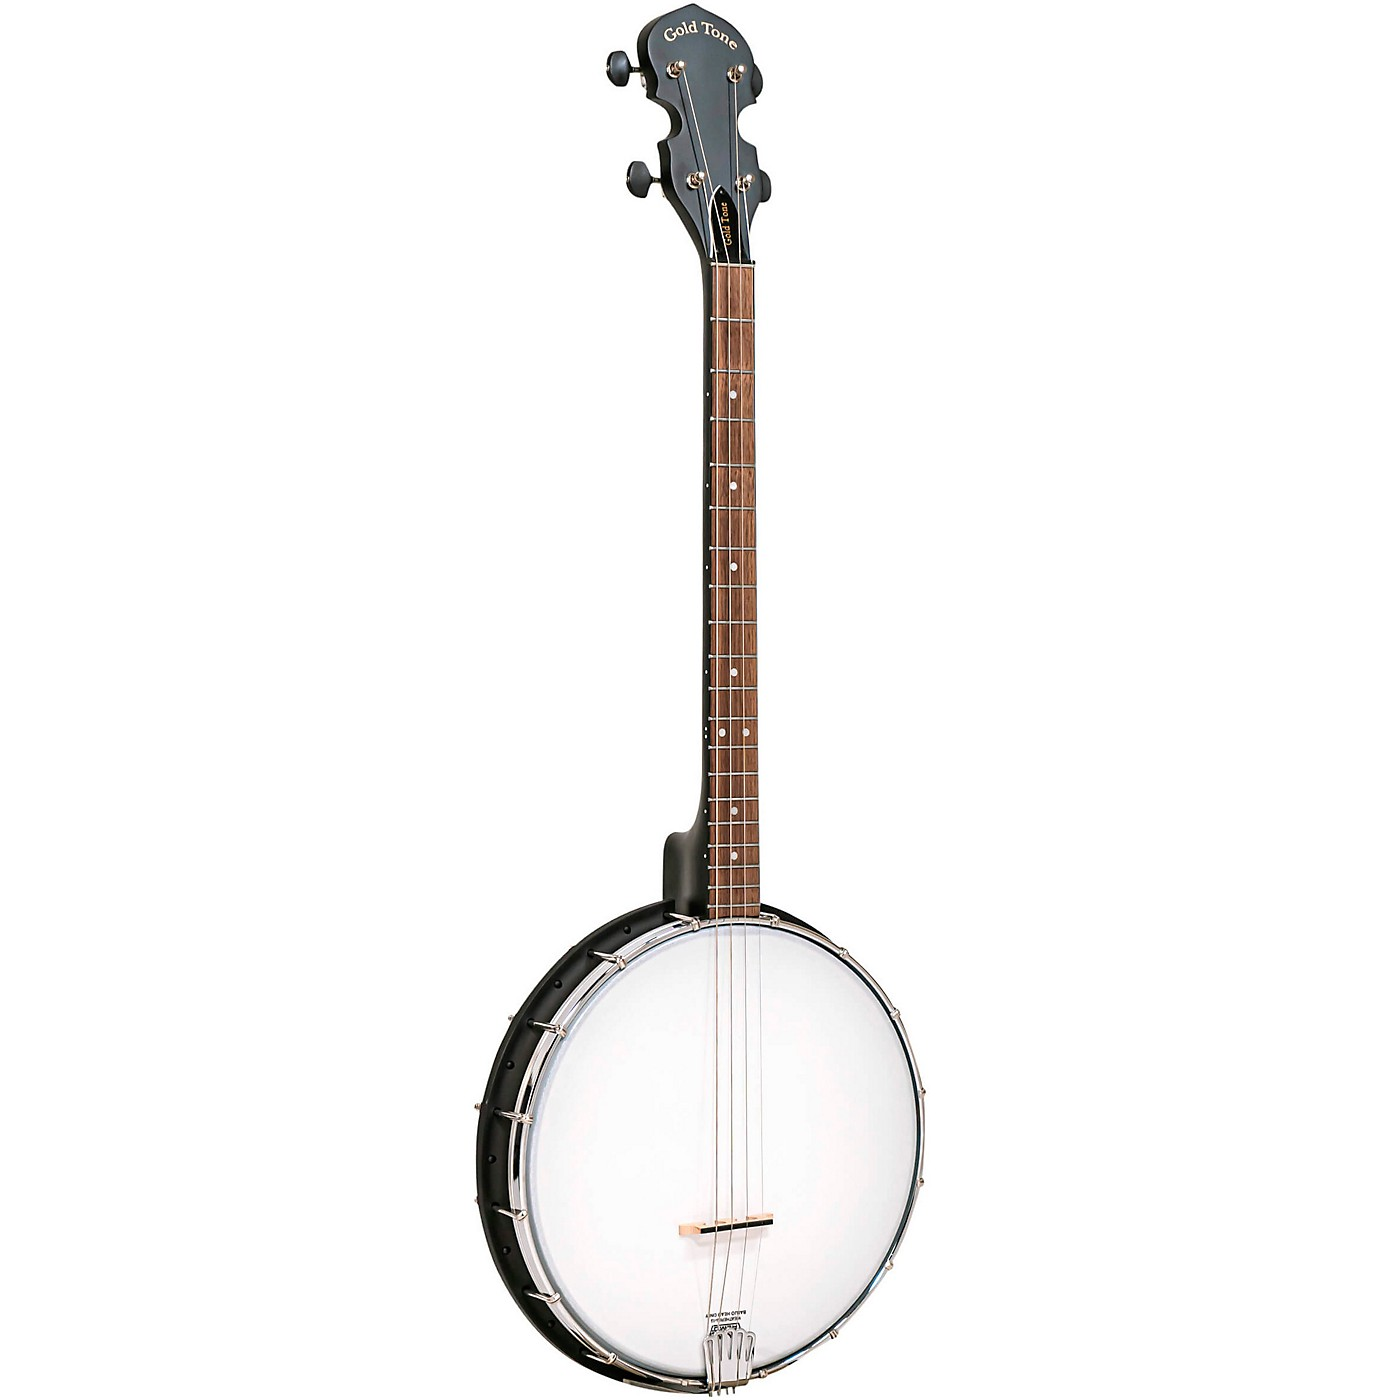 Gold Tone AC-4 Composite 4-String Openback Tenor Banjo thumbnail